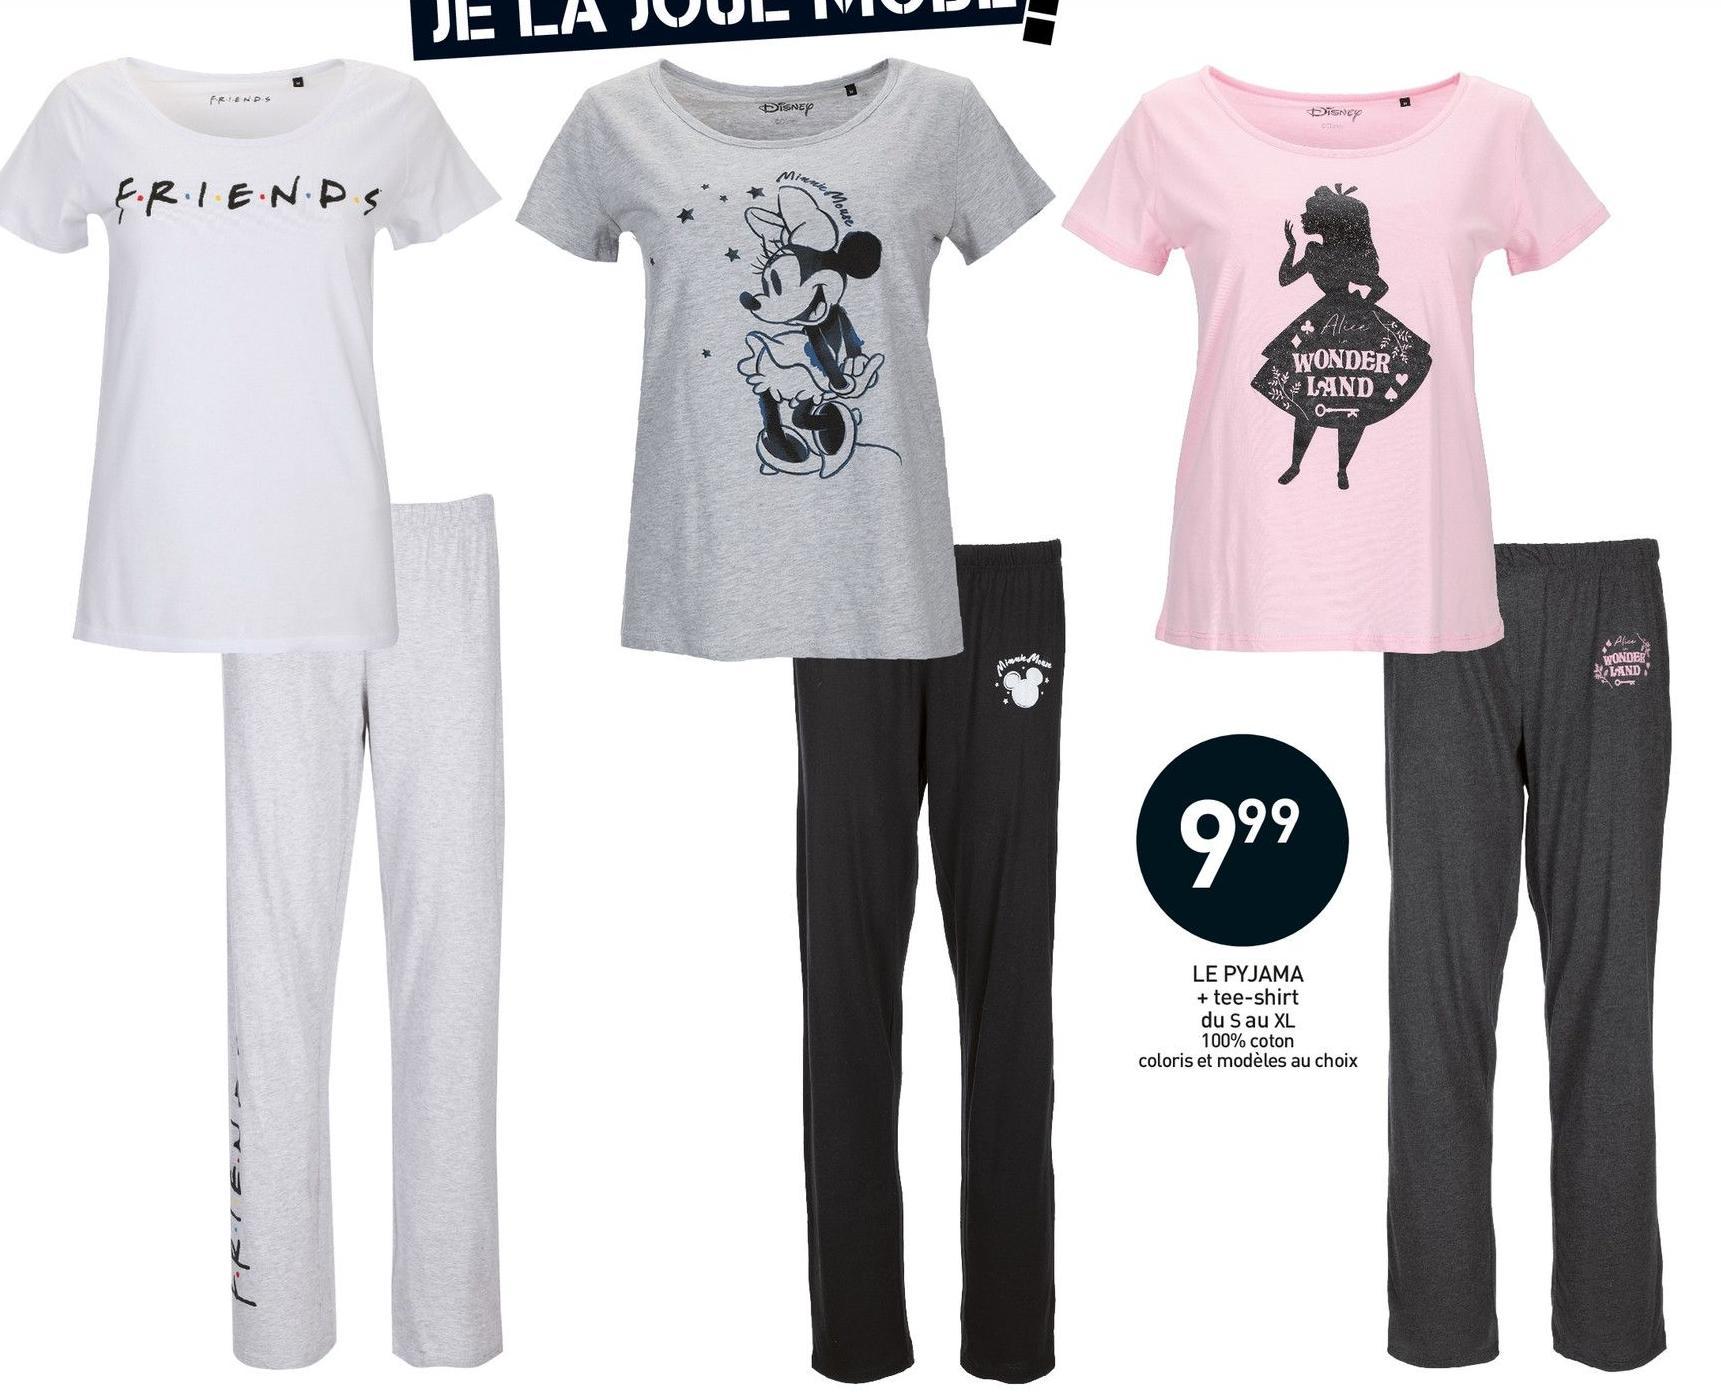 Sélection Pyjamas Femme 100% cotton - Ex Pyjama Friends